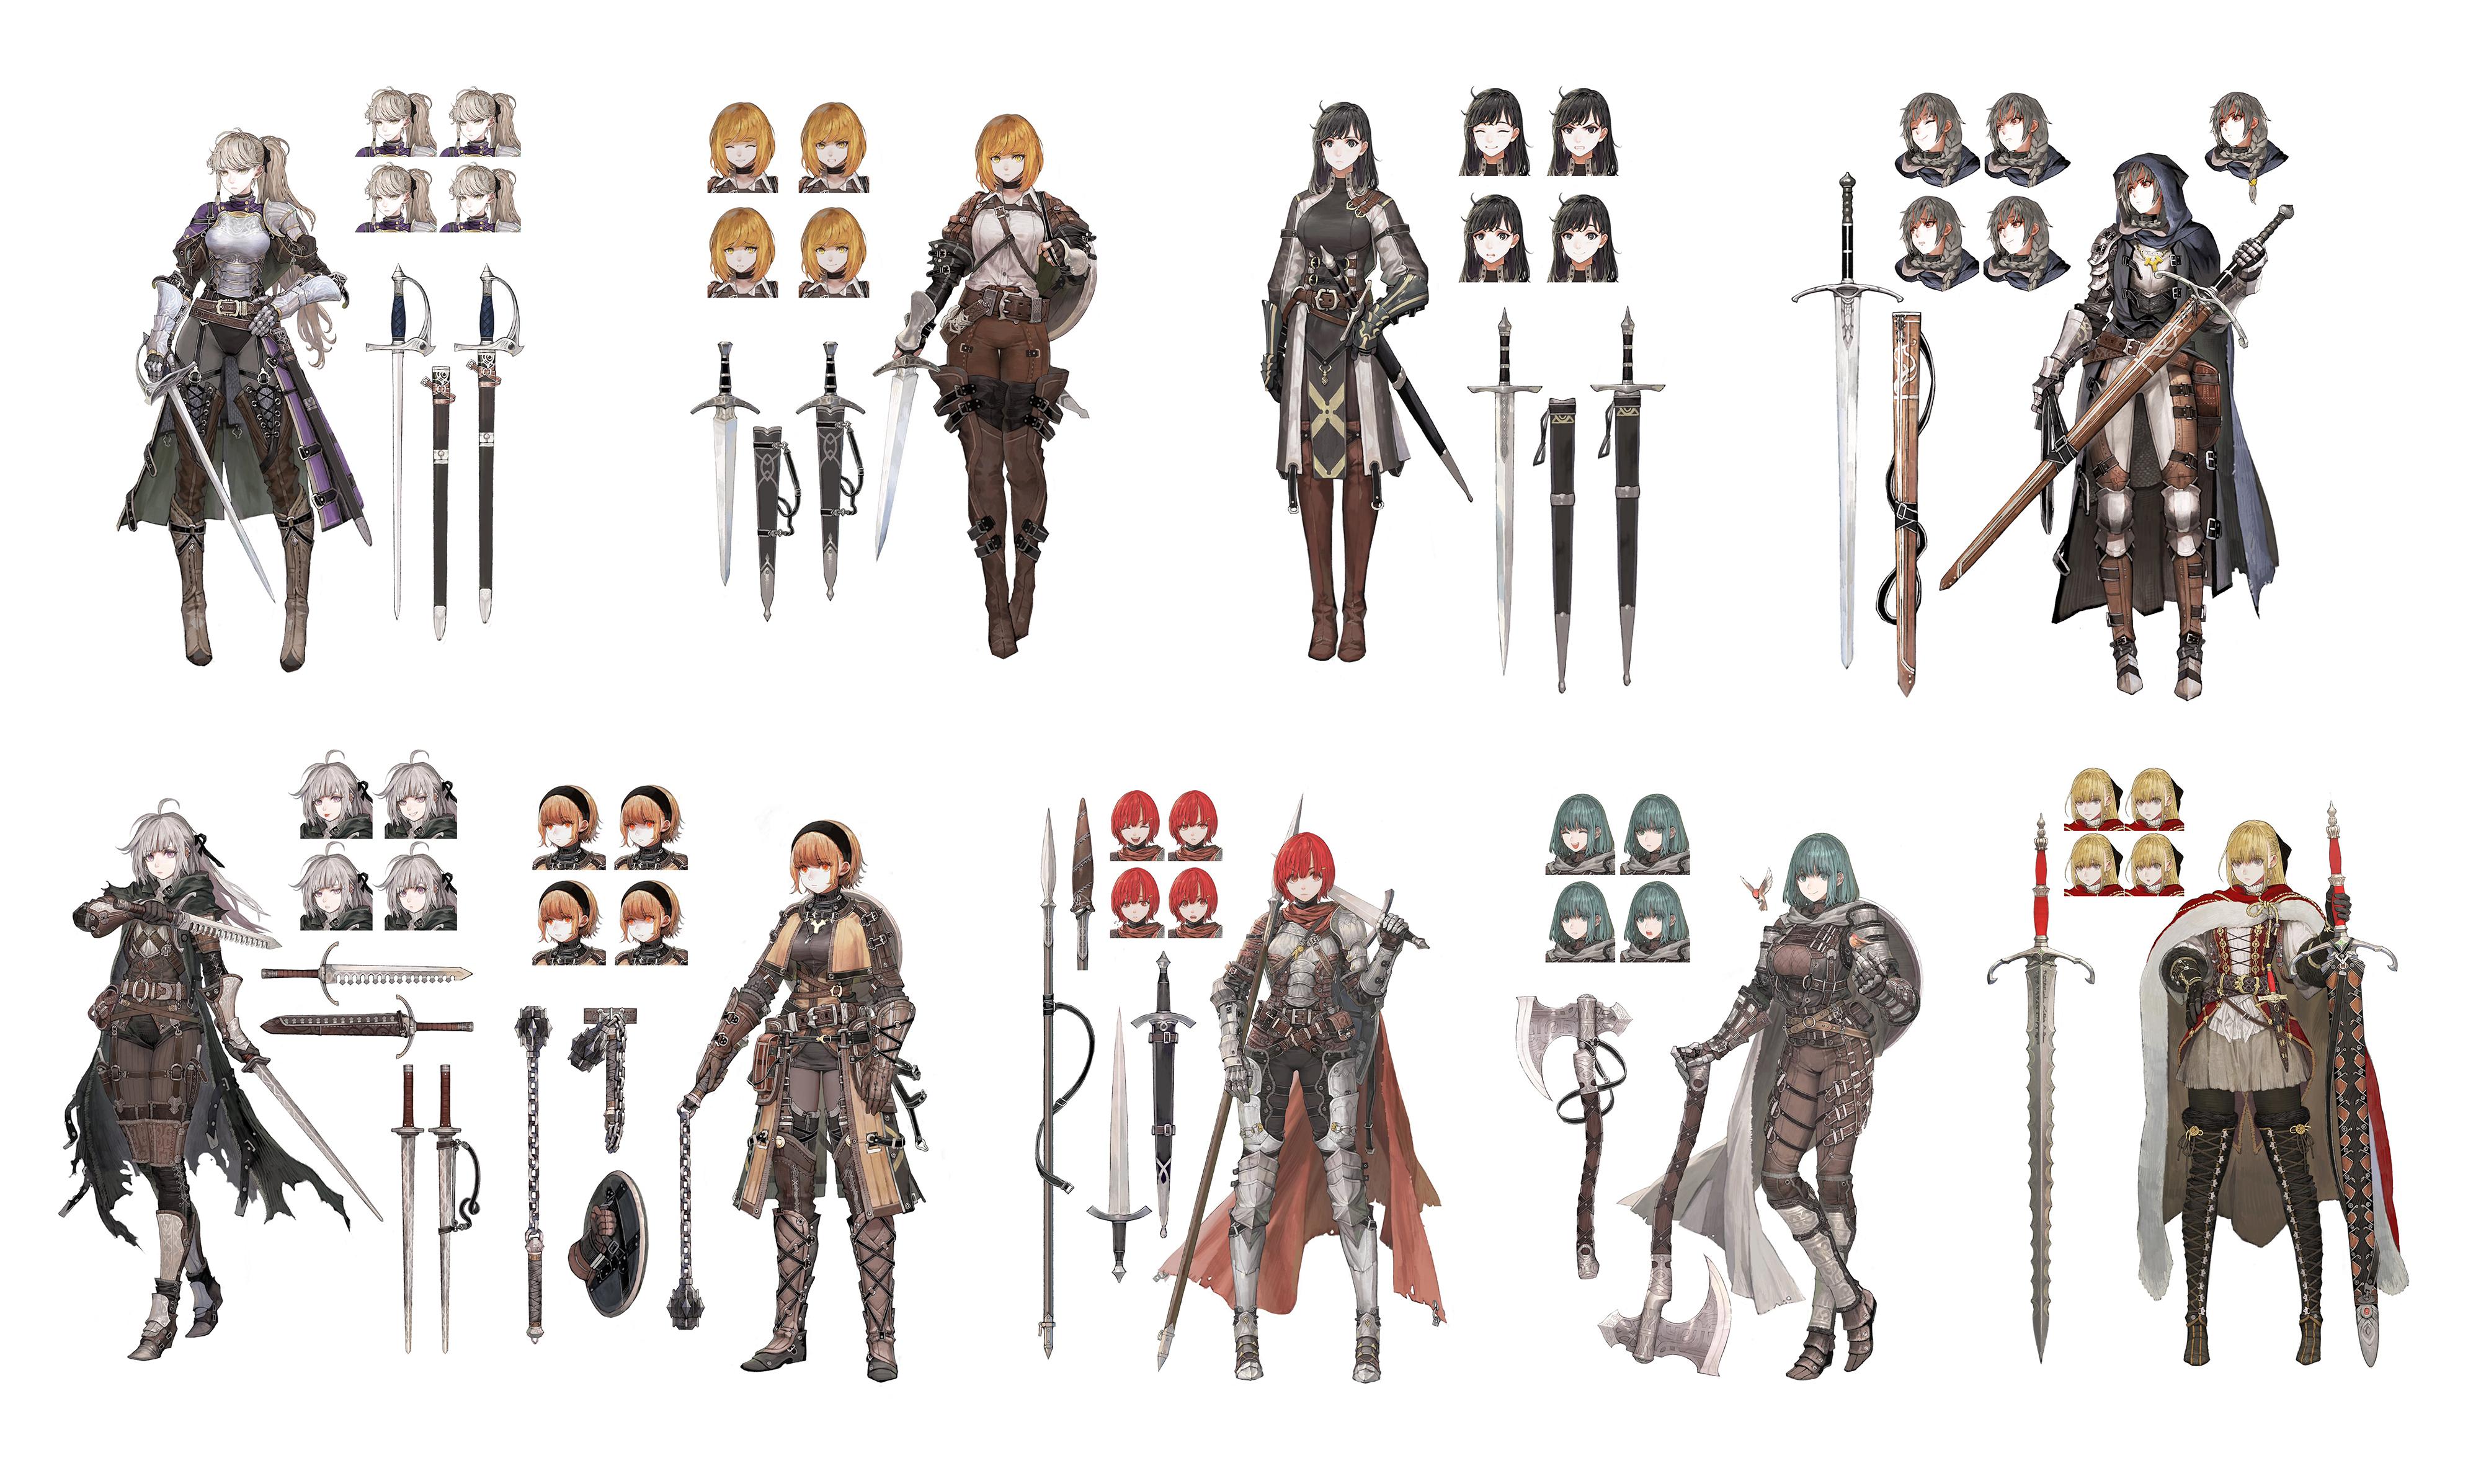 sword breaker, shortsword, zweihander, flamberge, longsword